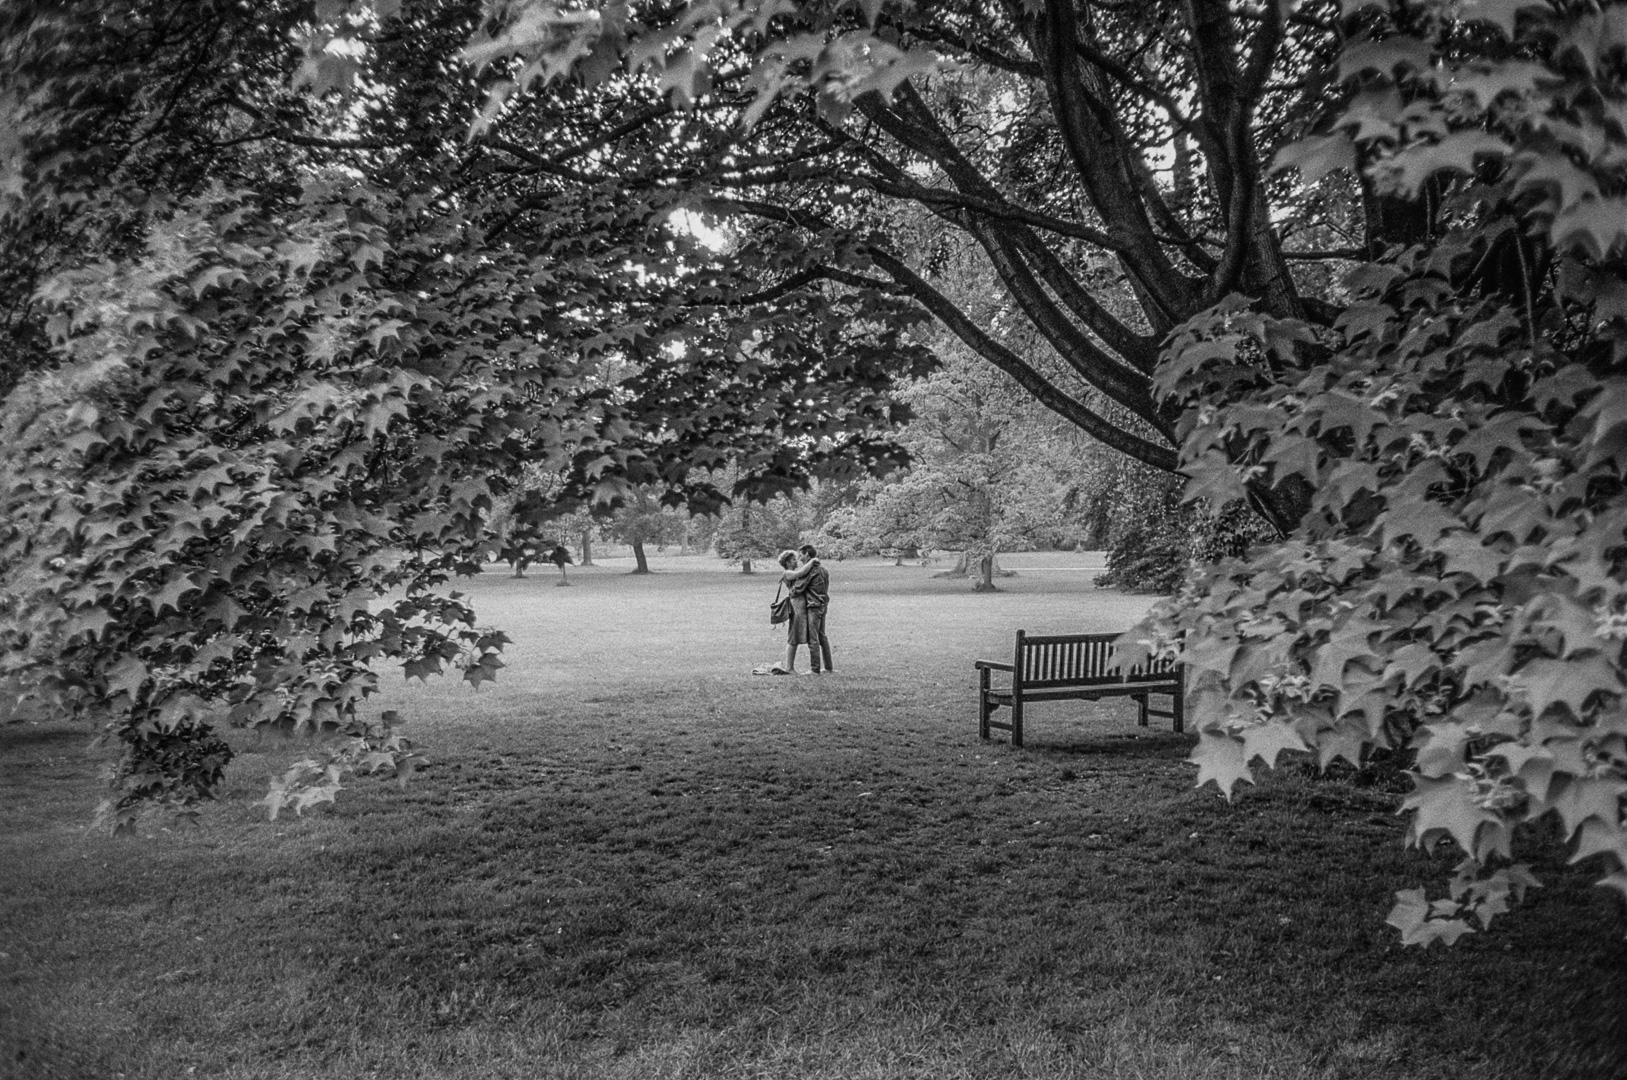 Kew gardens, Londres, juin 1984.